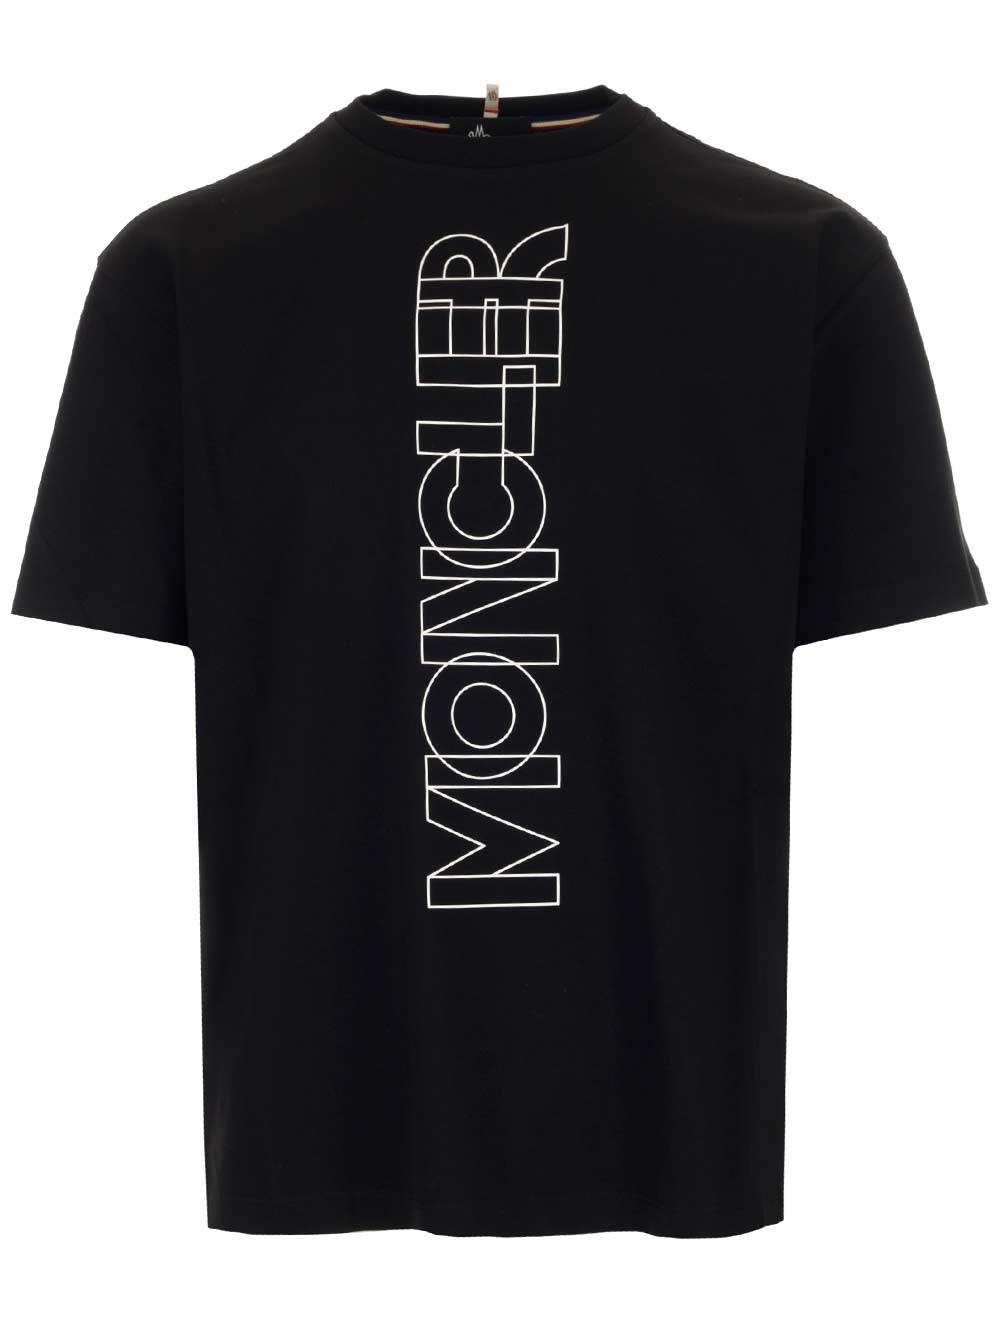 MONCLER GRENOBLE Black T-Shirt With Maxi Logo